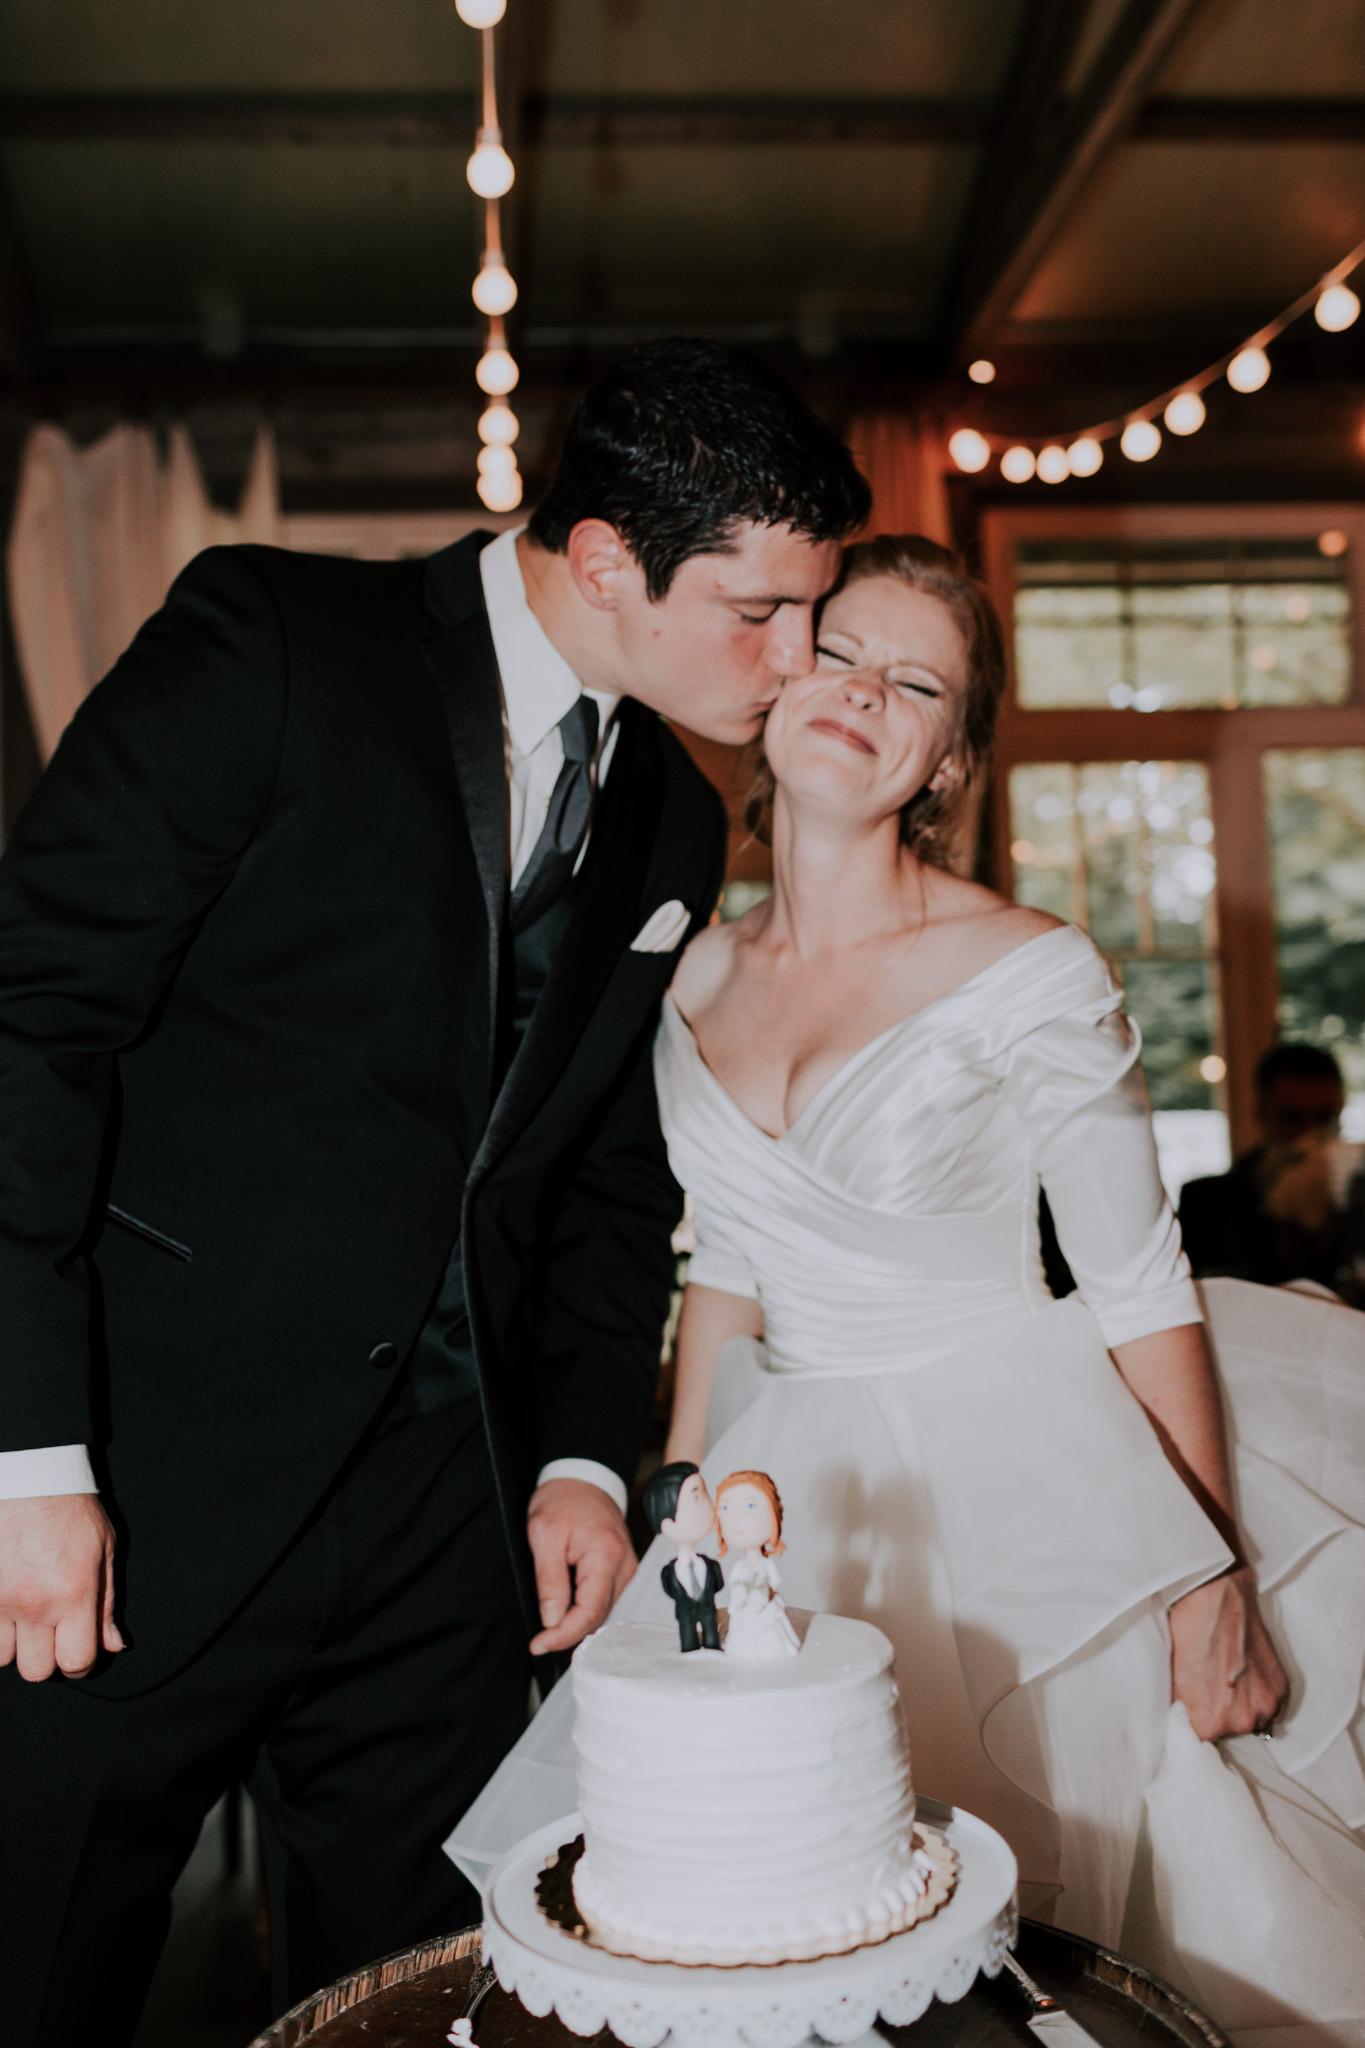 MillCreek-Wilde-Wedding-Barn-Michigan-Eliza-Eric-Vafa-Photo1063.jpg